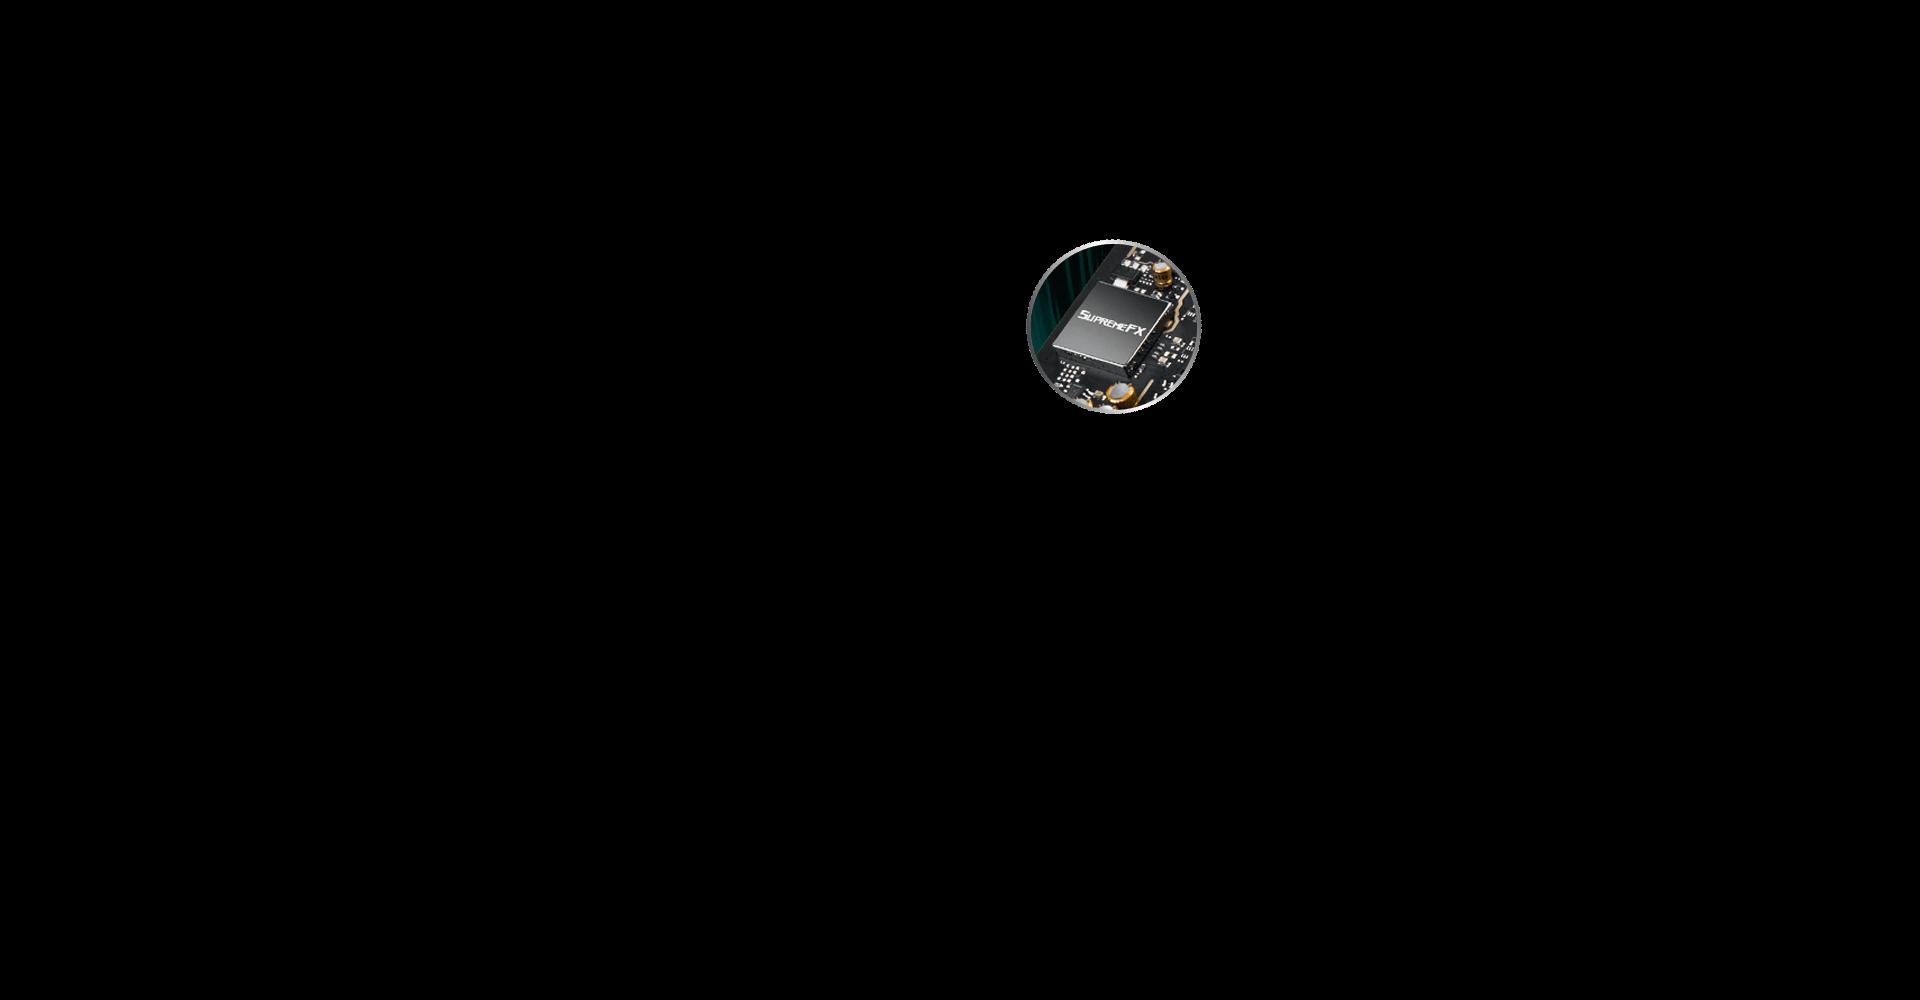 ROG STRIX Z390-F GAMING | Motherboards | ASUS USA